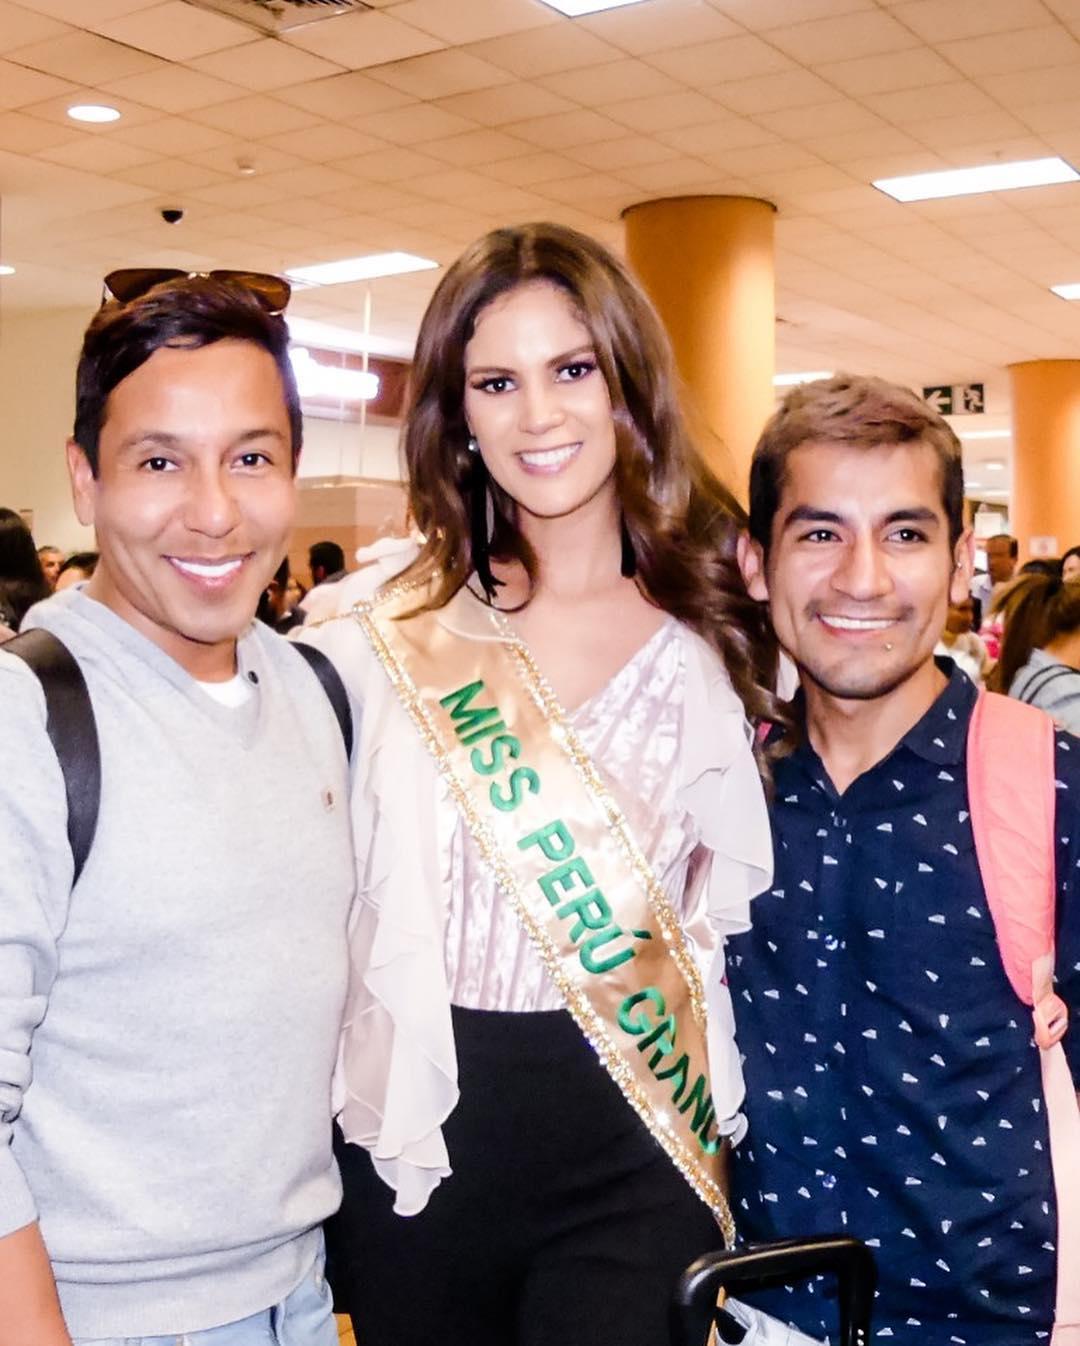 andrea moberg, top 20 de miss grand international 2018 (best national costume). - Página 3 41715011